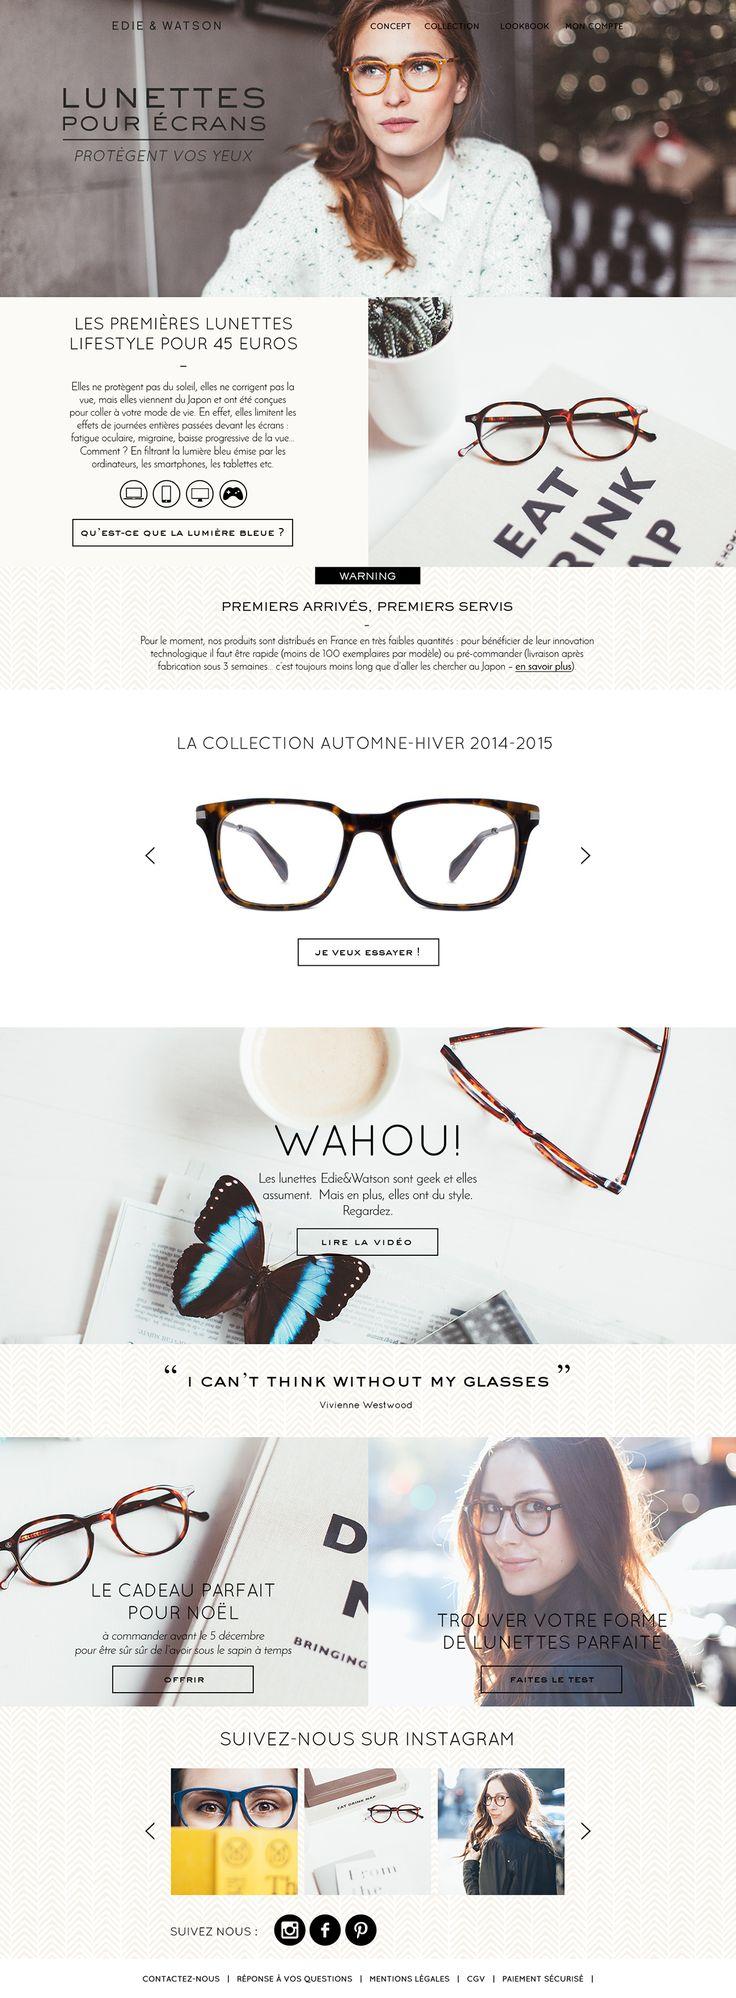 EDIE & WATSON - Brand Identity, Web Design, Packaging. on Behance